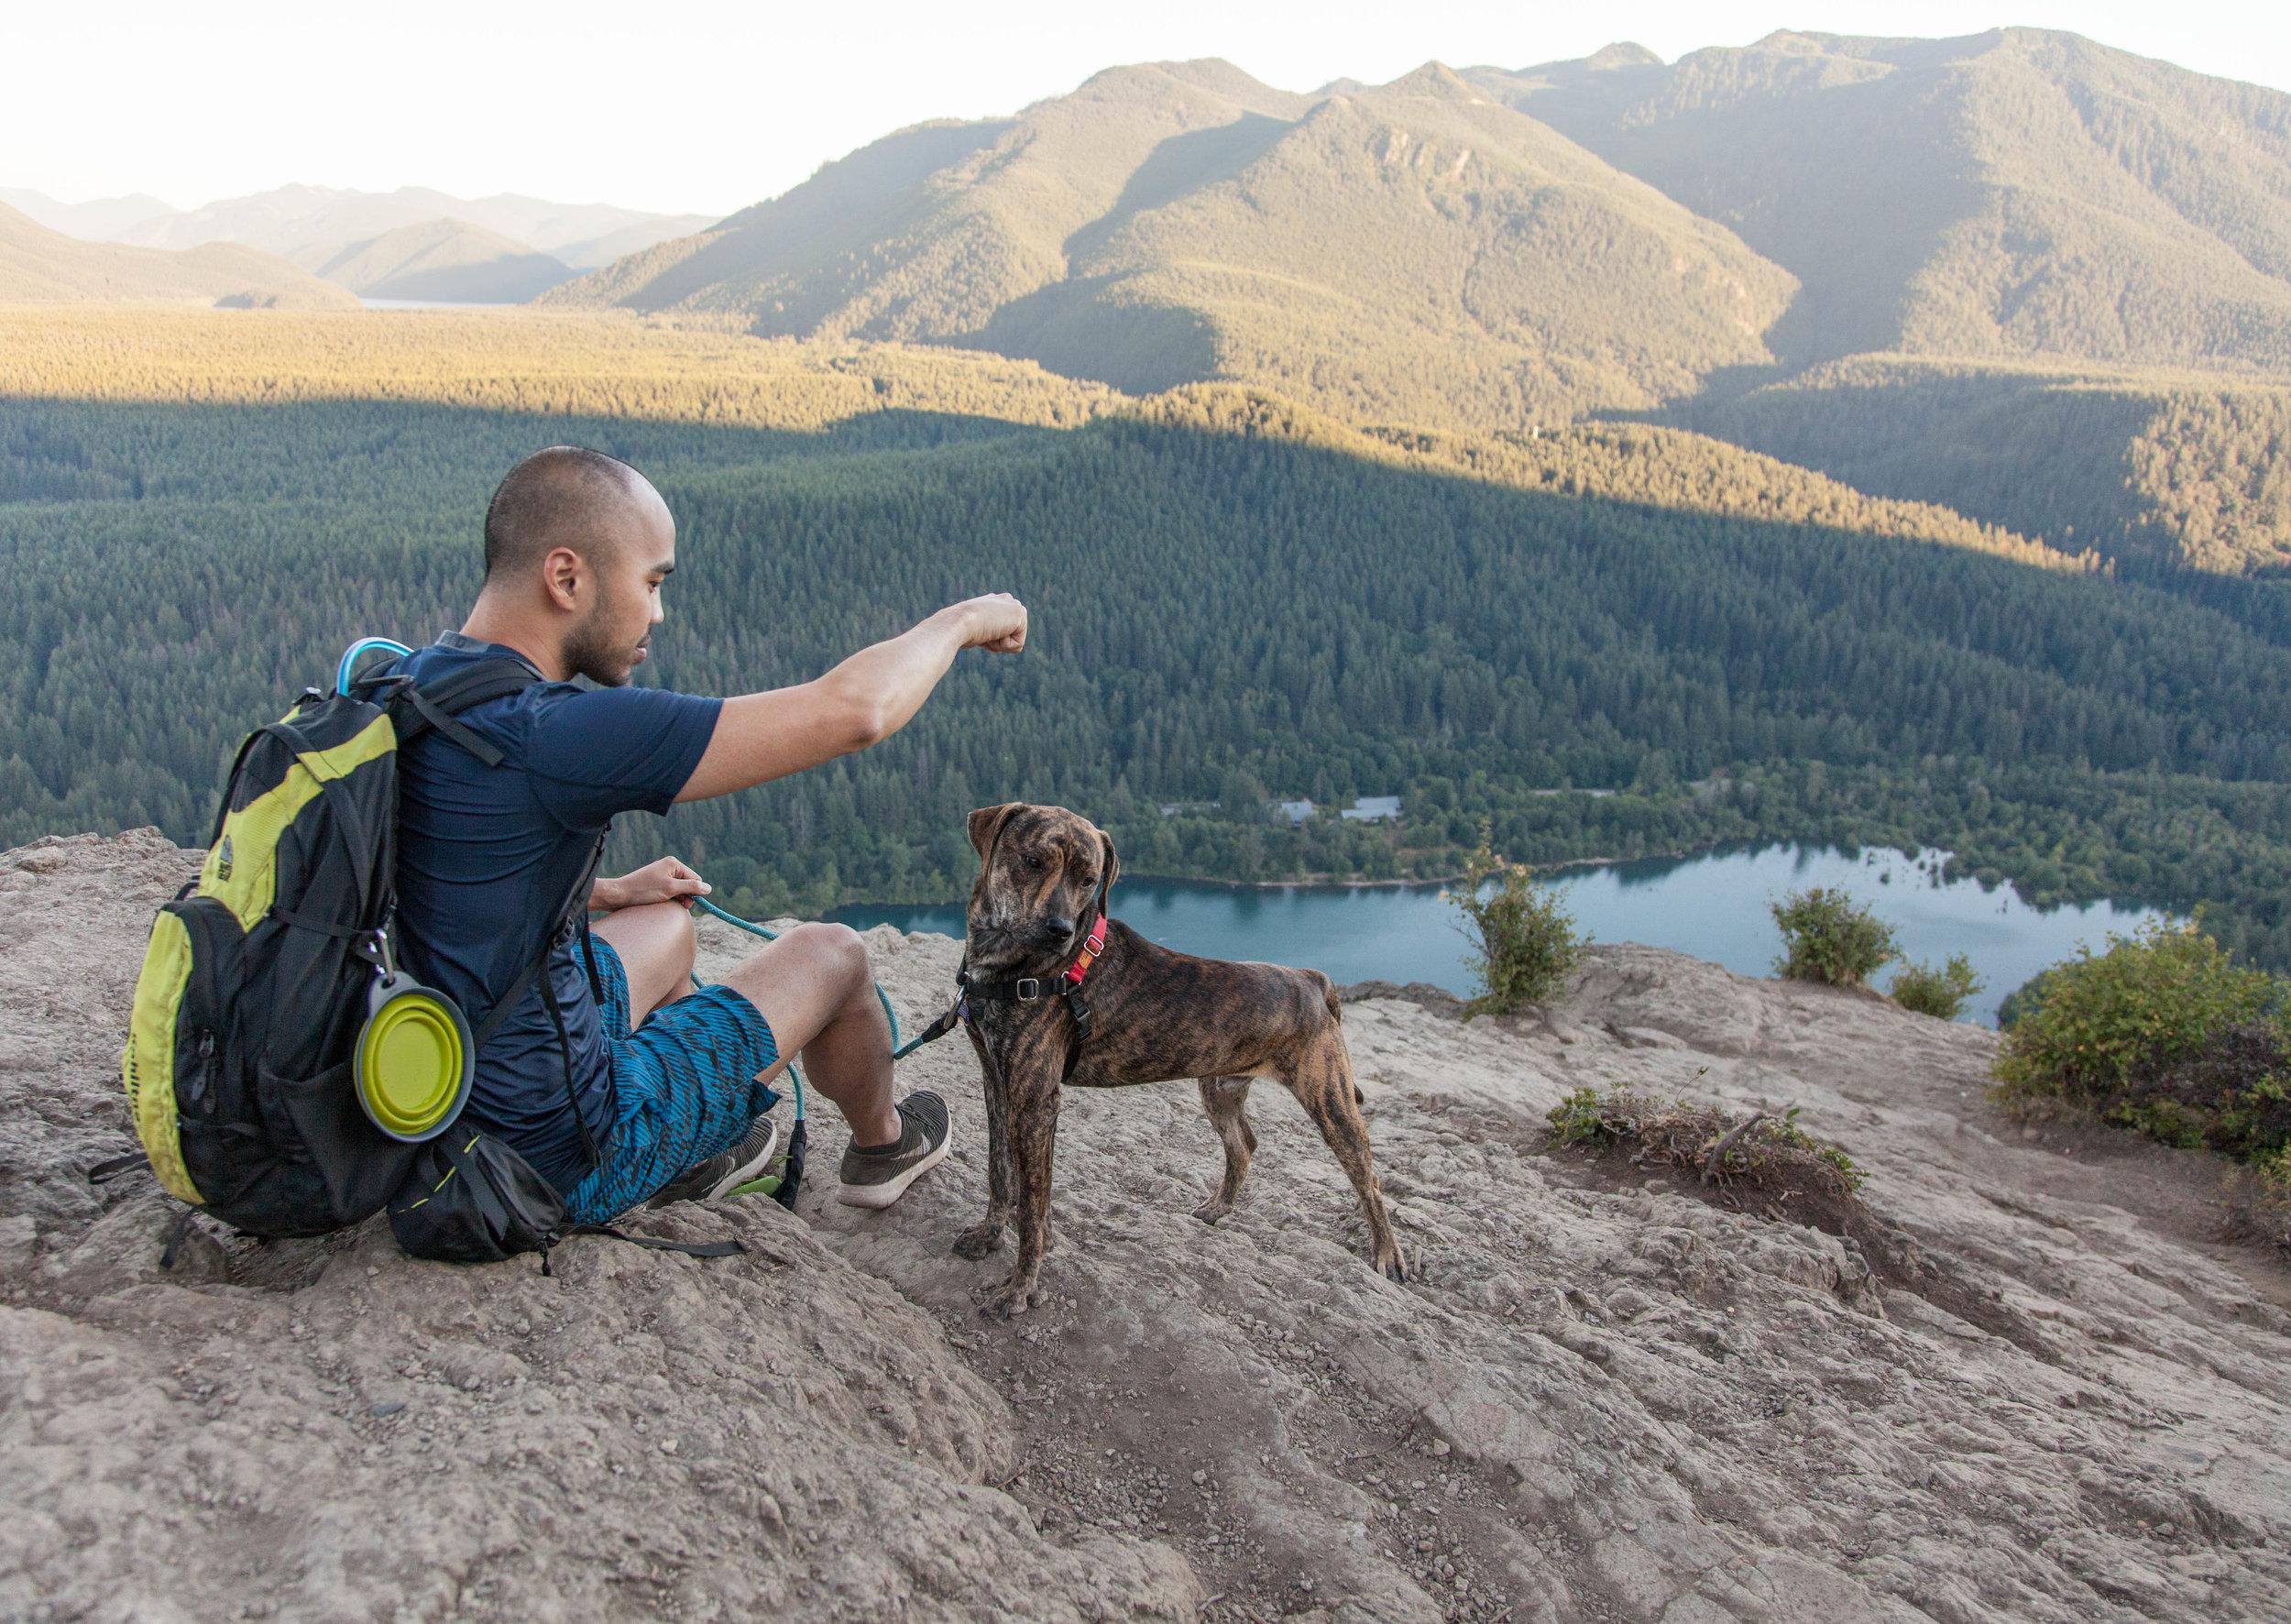 Kuma on his first hike to Rattlesnake Ledge